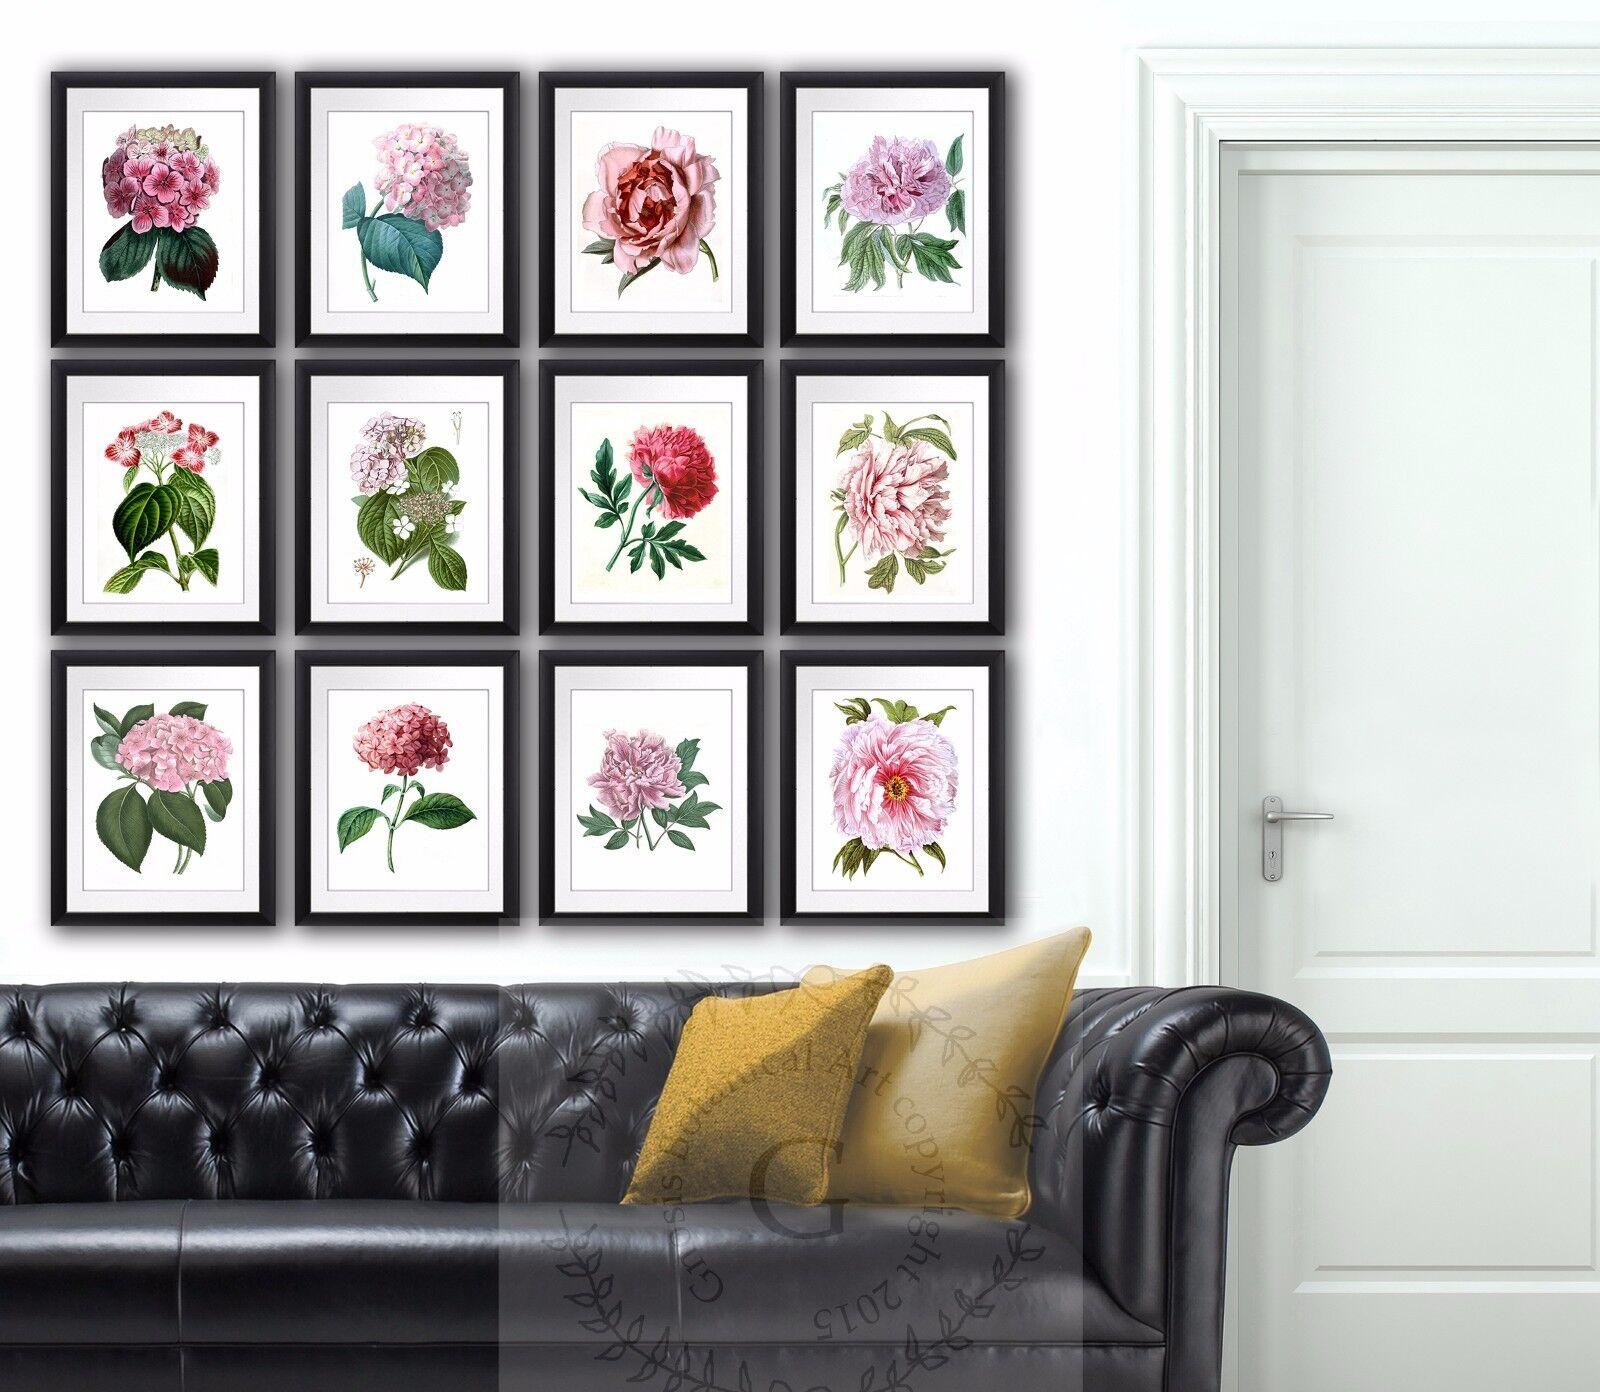 rose Peonies hydrangea flower botanical illustrations set of 12 wall Hanging